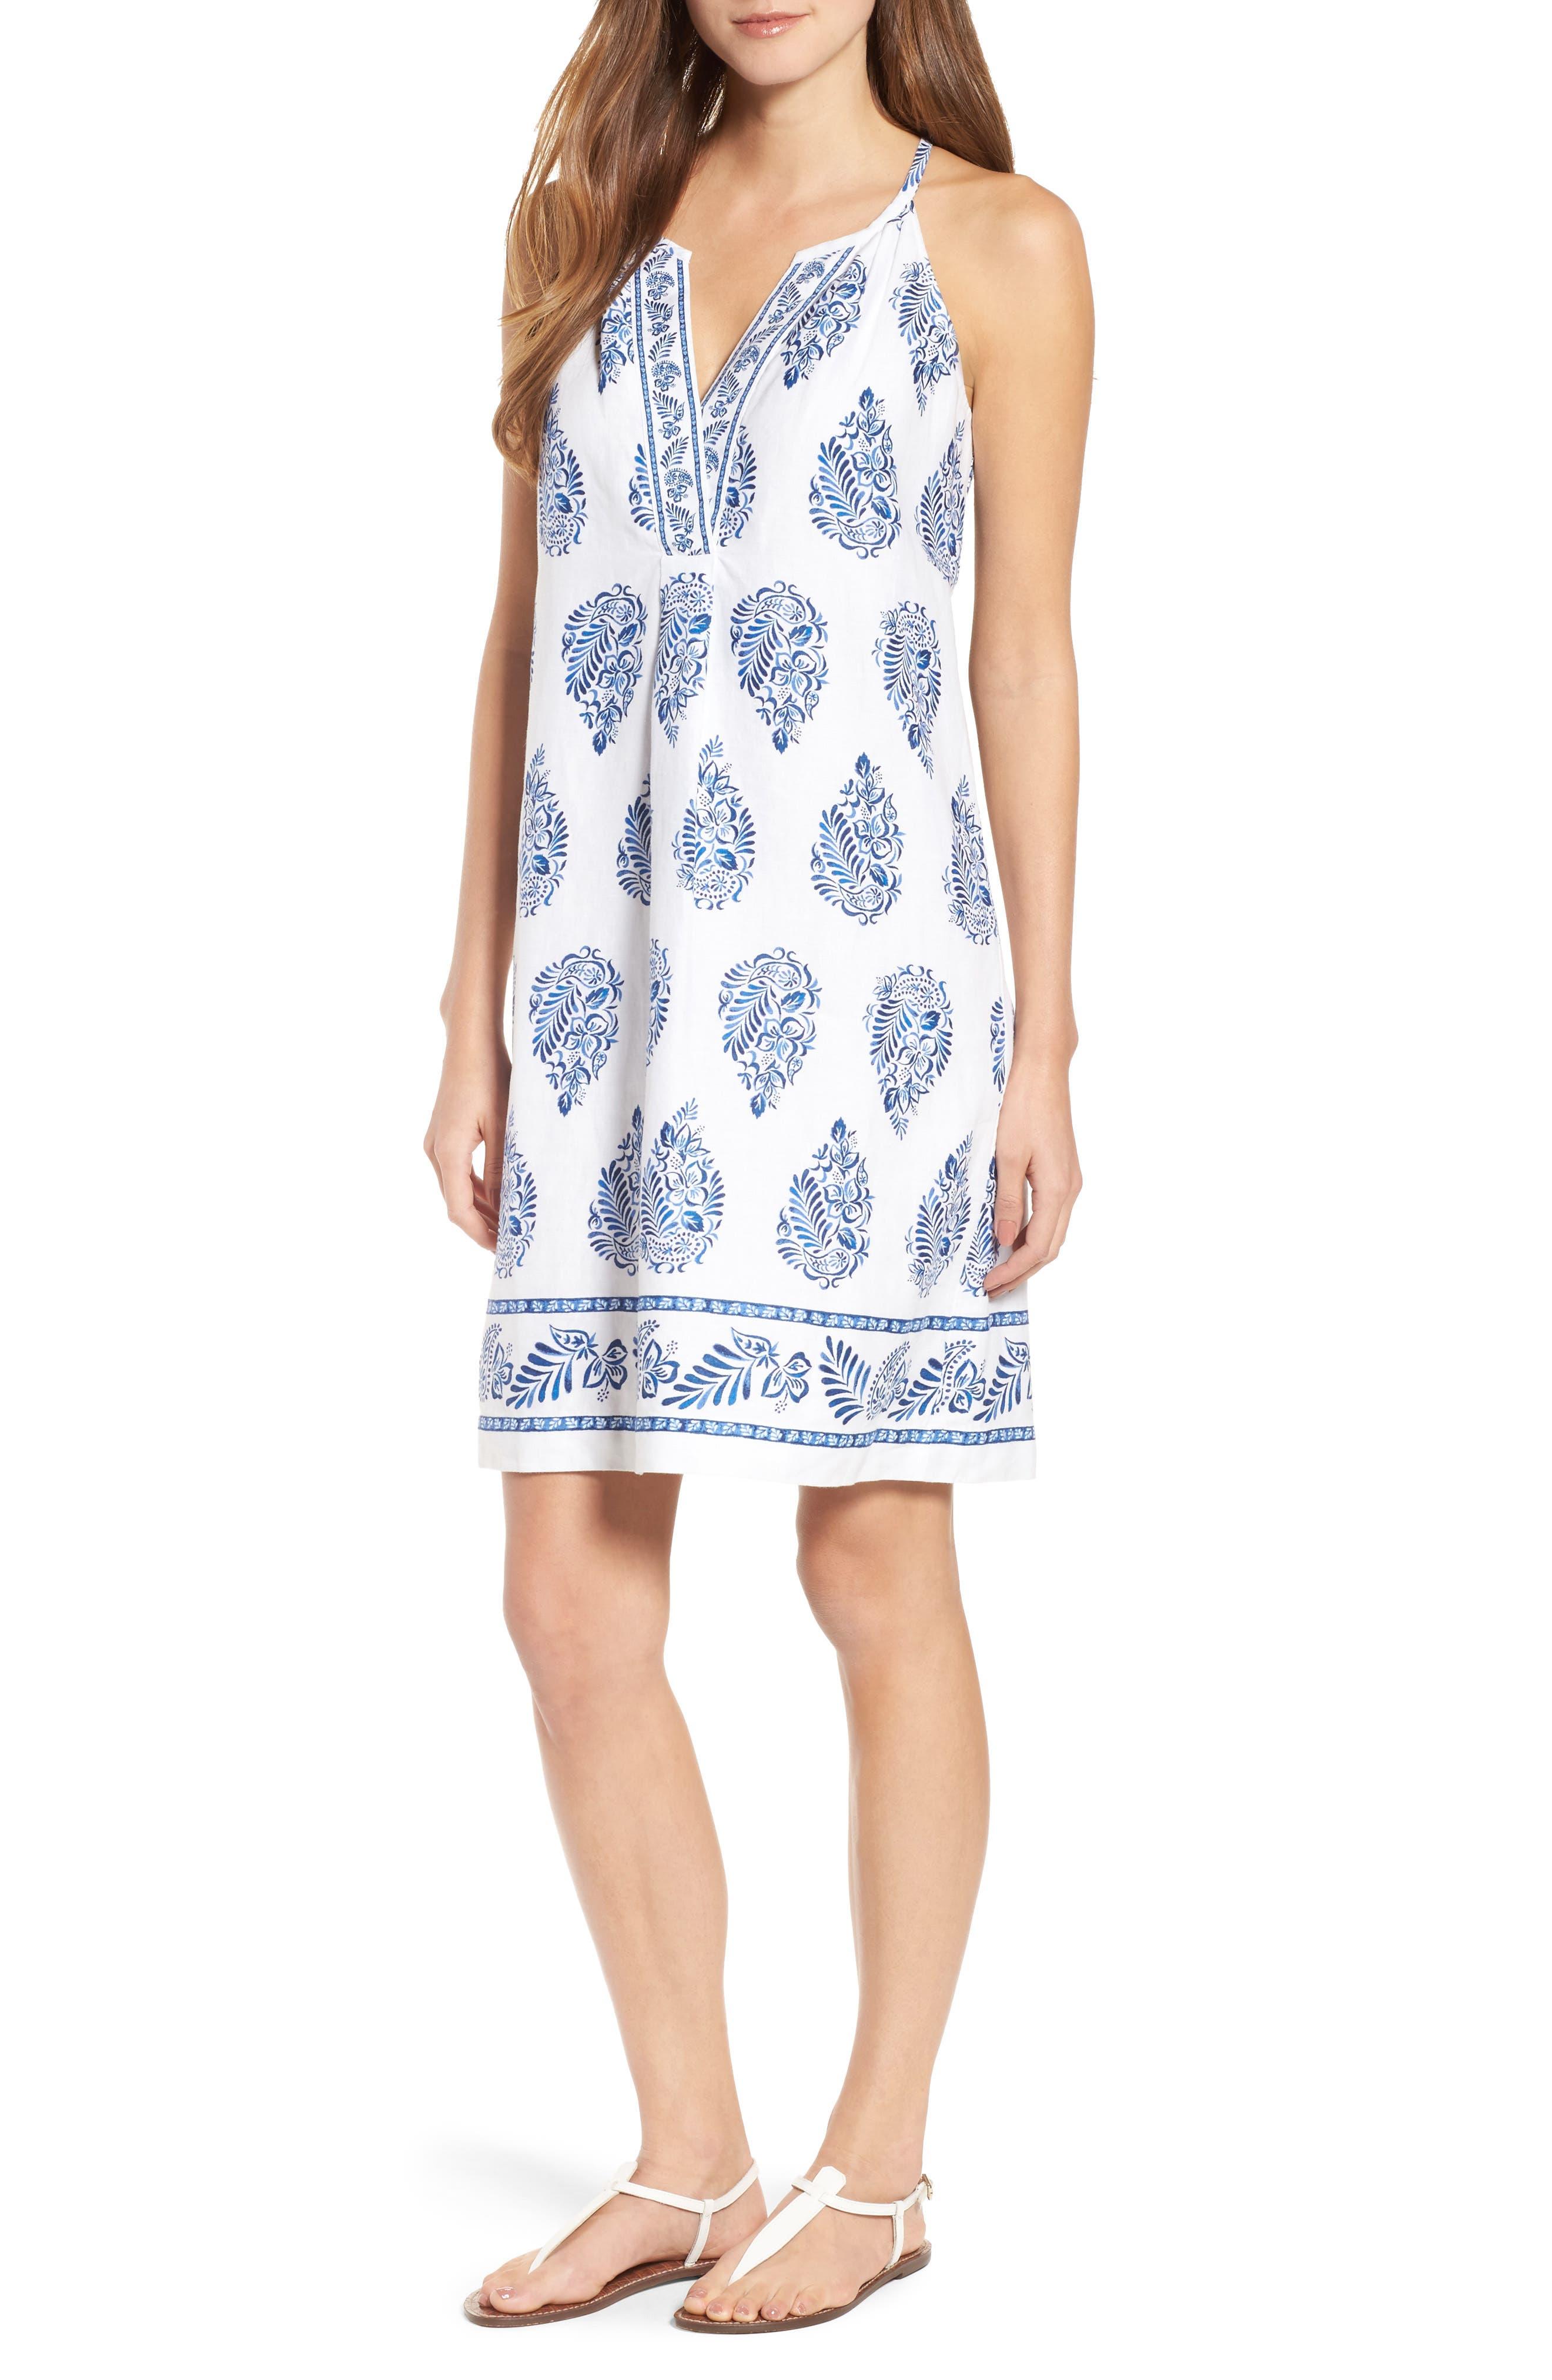 Paleys Paisley Sleeveless Shift Dress,                             Main thumbnail 1, color,                             401